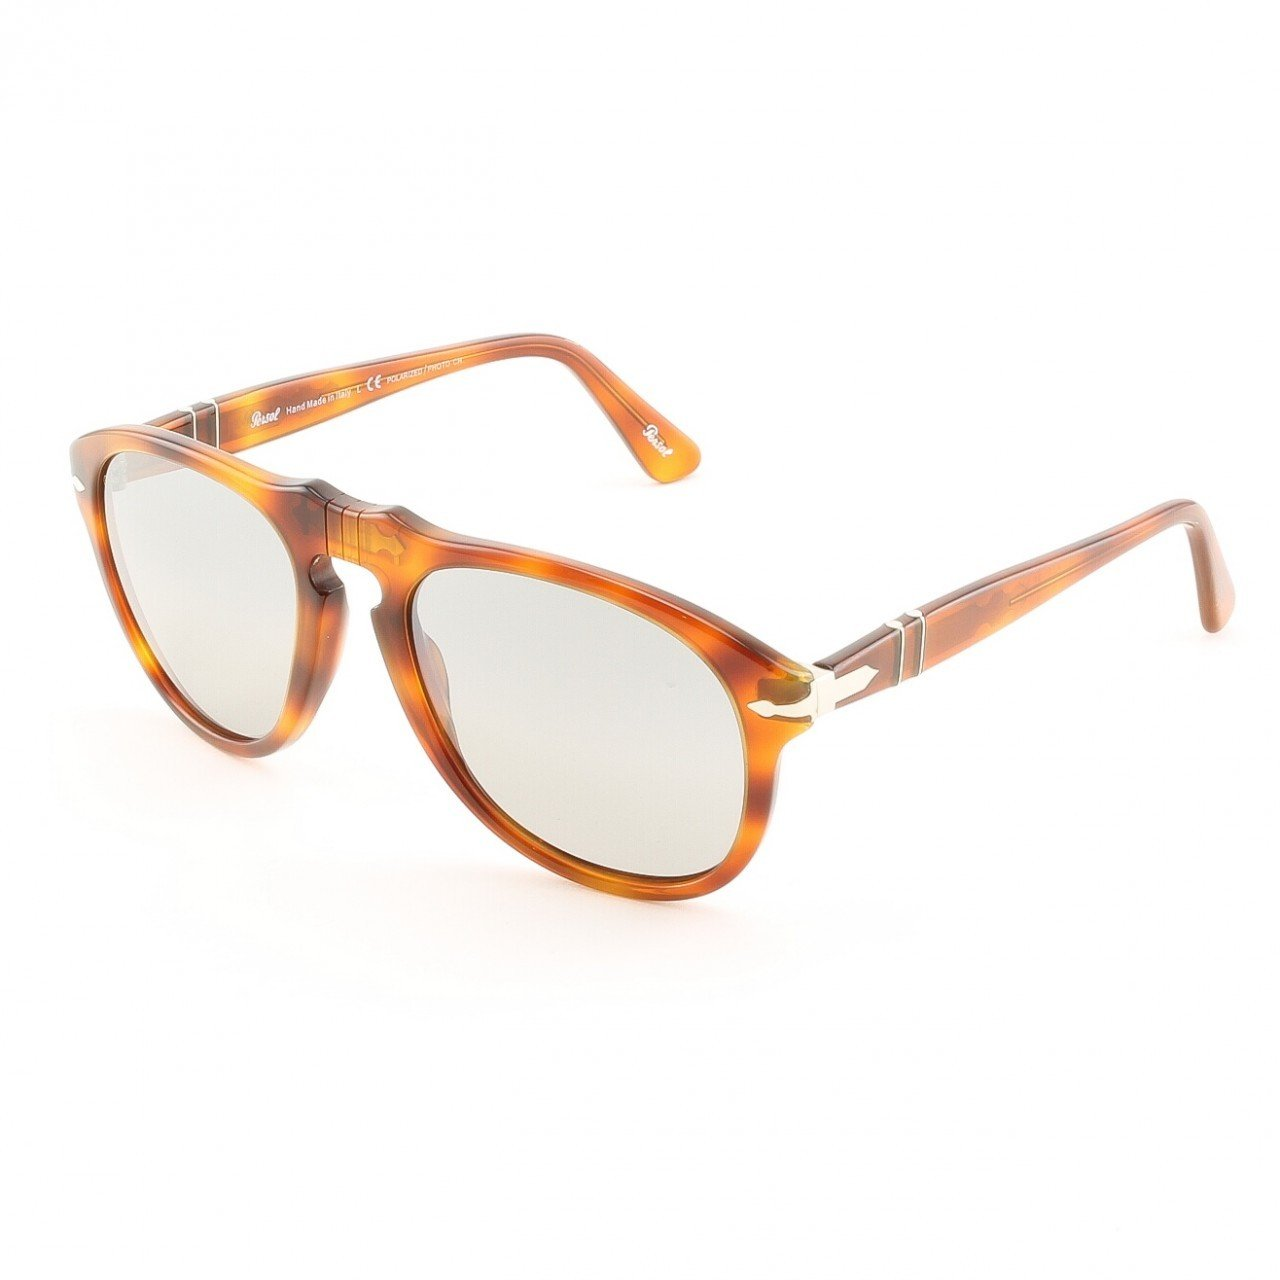 Persol PO0649 96/82 54mm Light Havana Sunglasses with Grey Photochromic Polarized Lenses